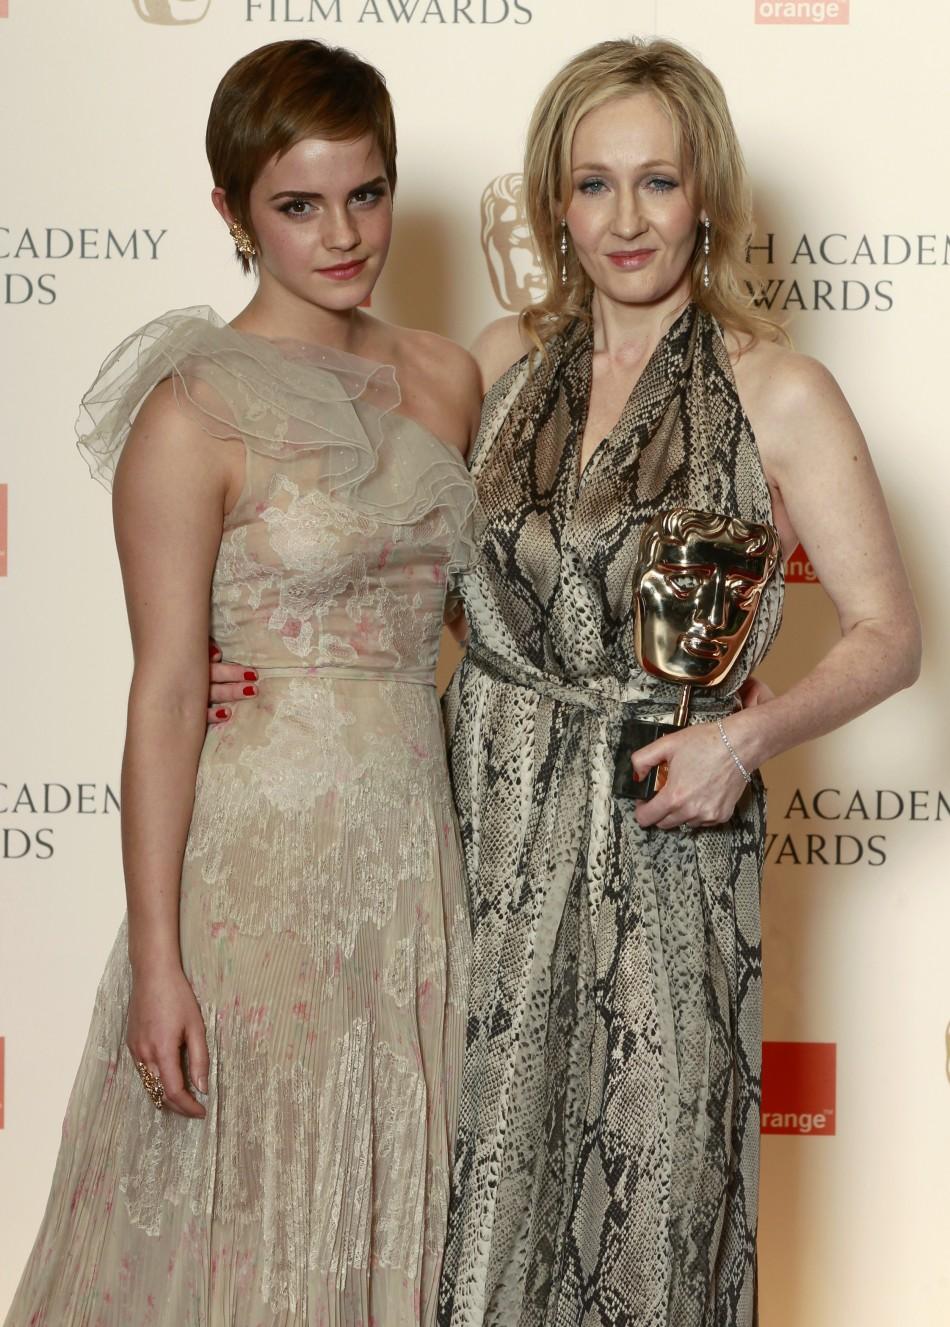 J.K.Rowling on February 13, 2011.